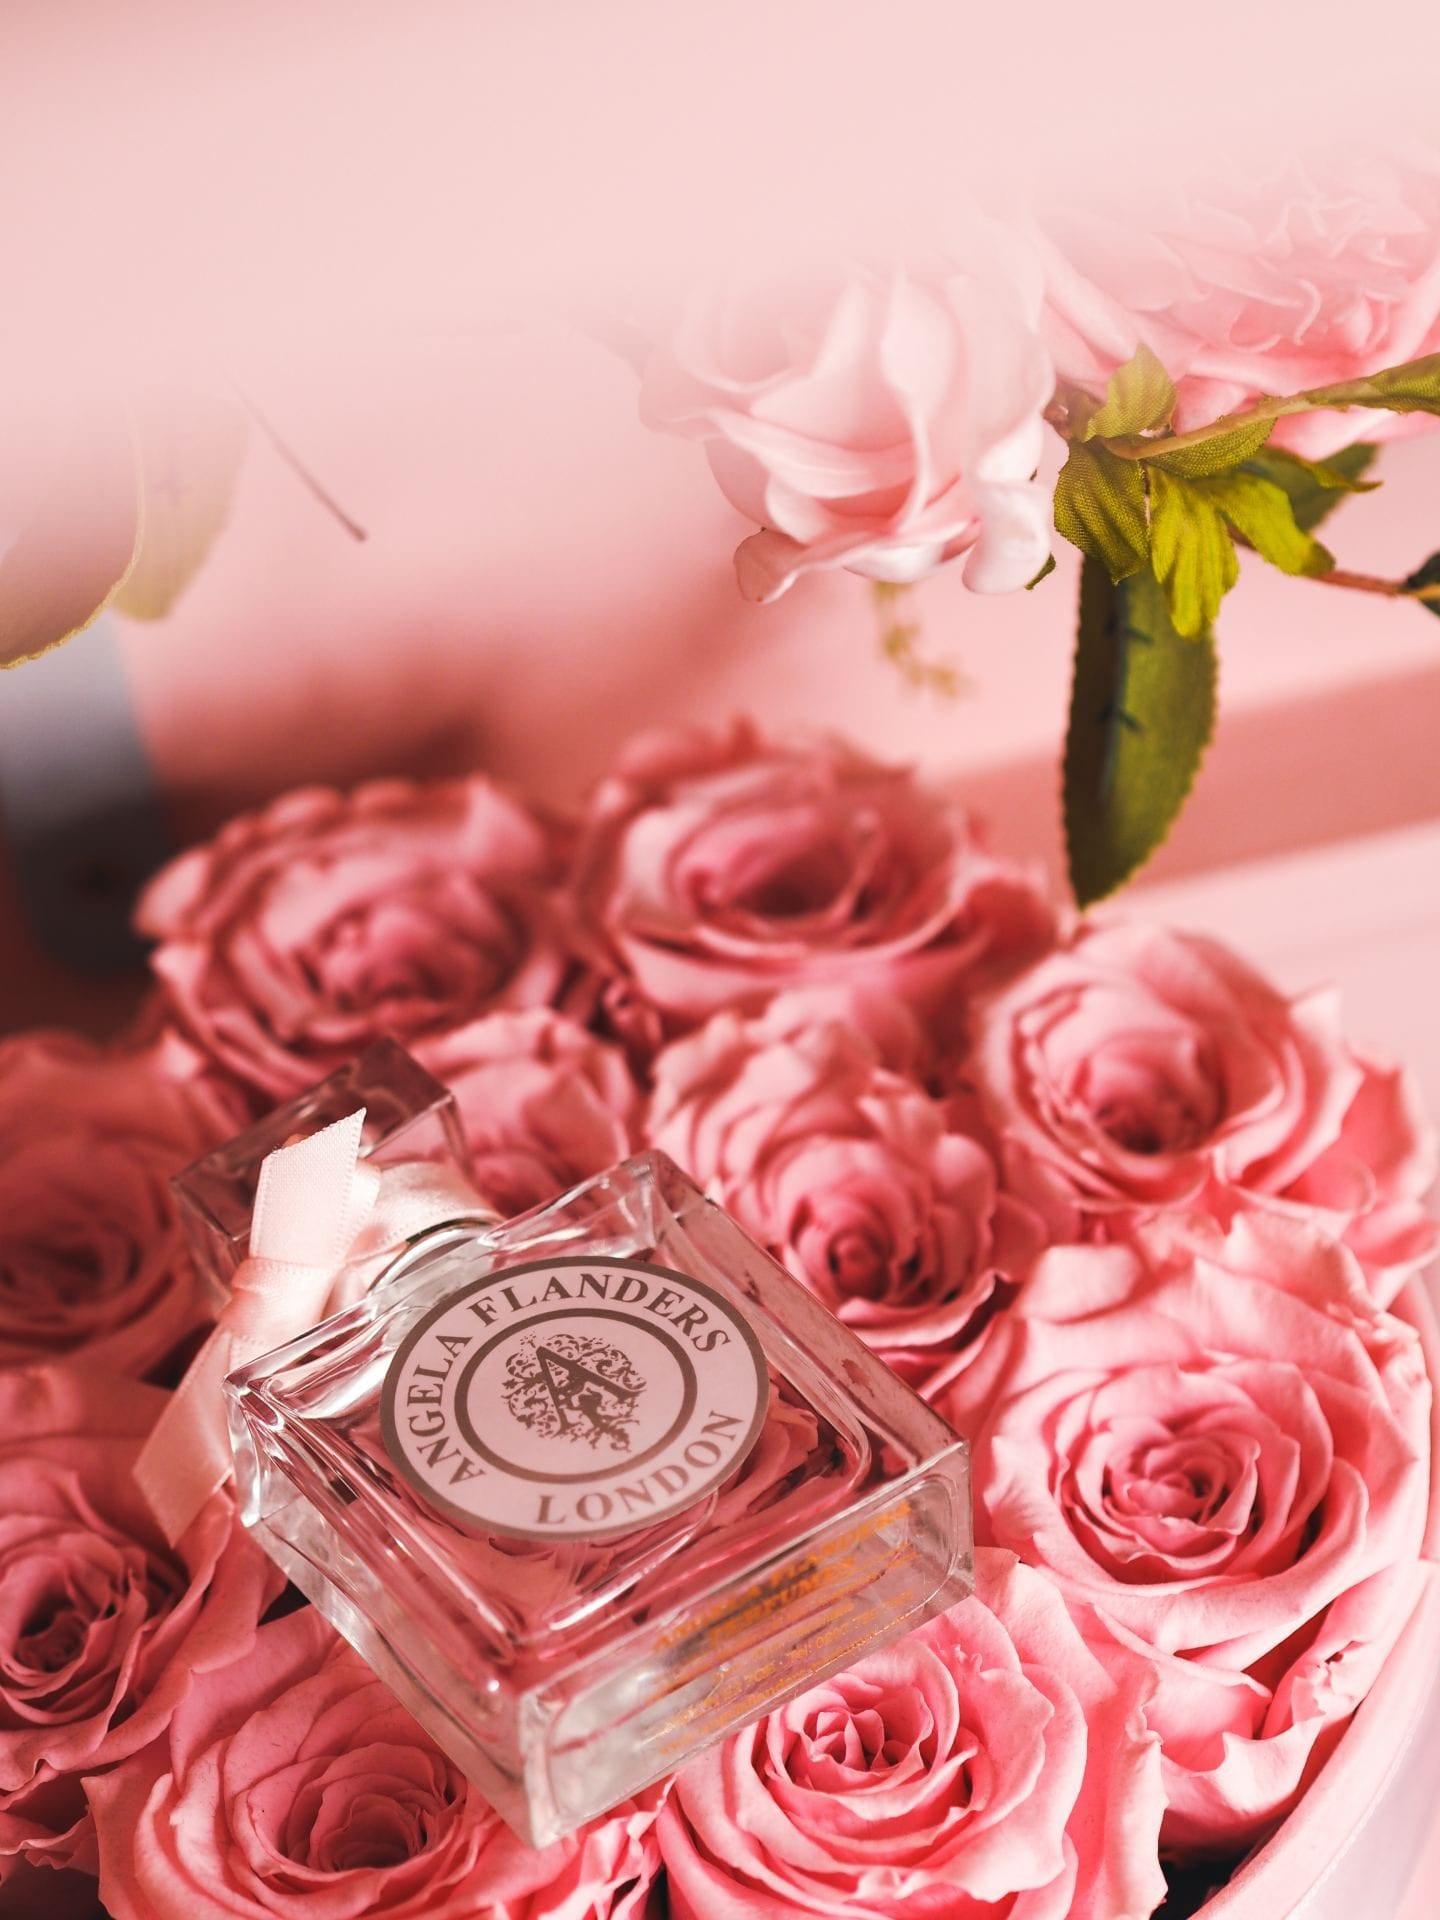 Angela Flander 'Rose' Perfume